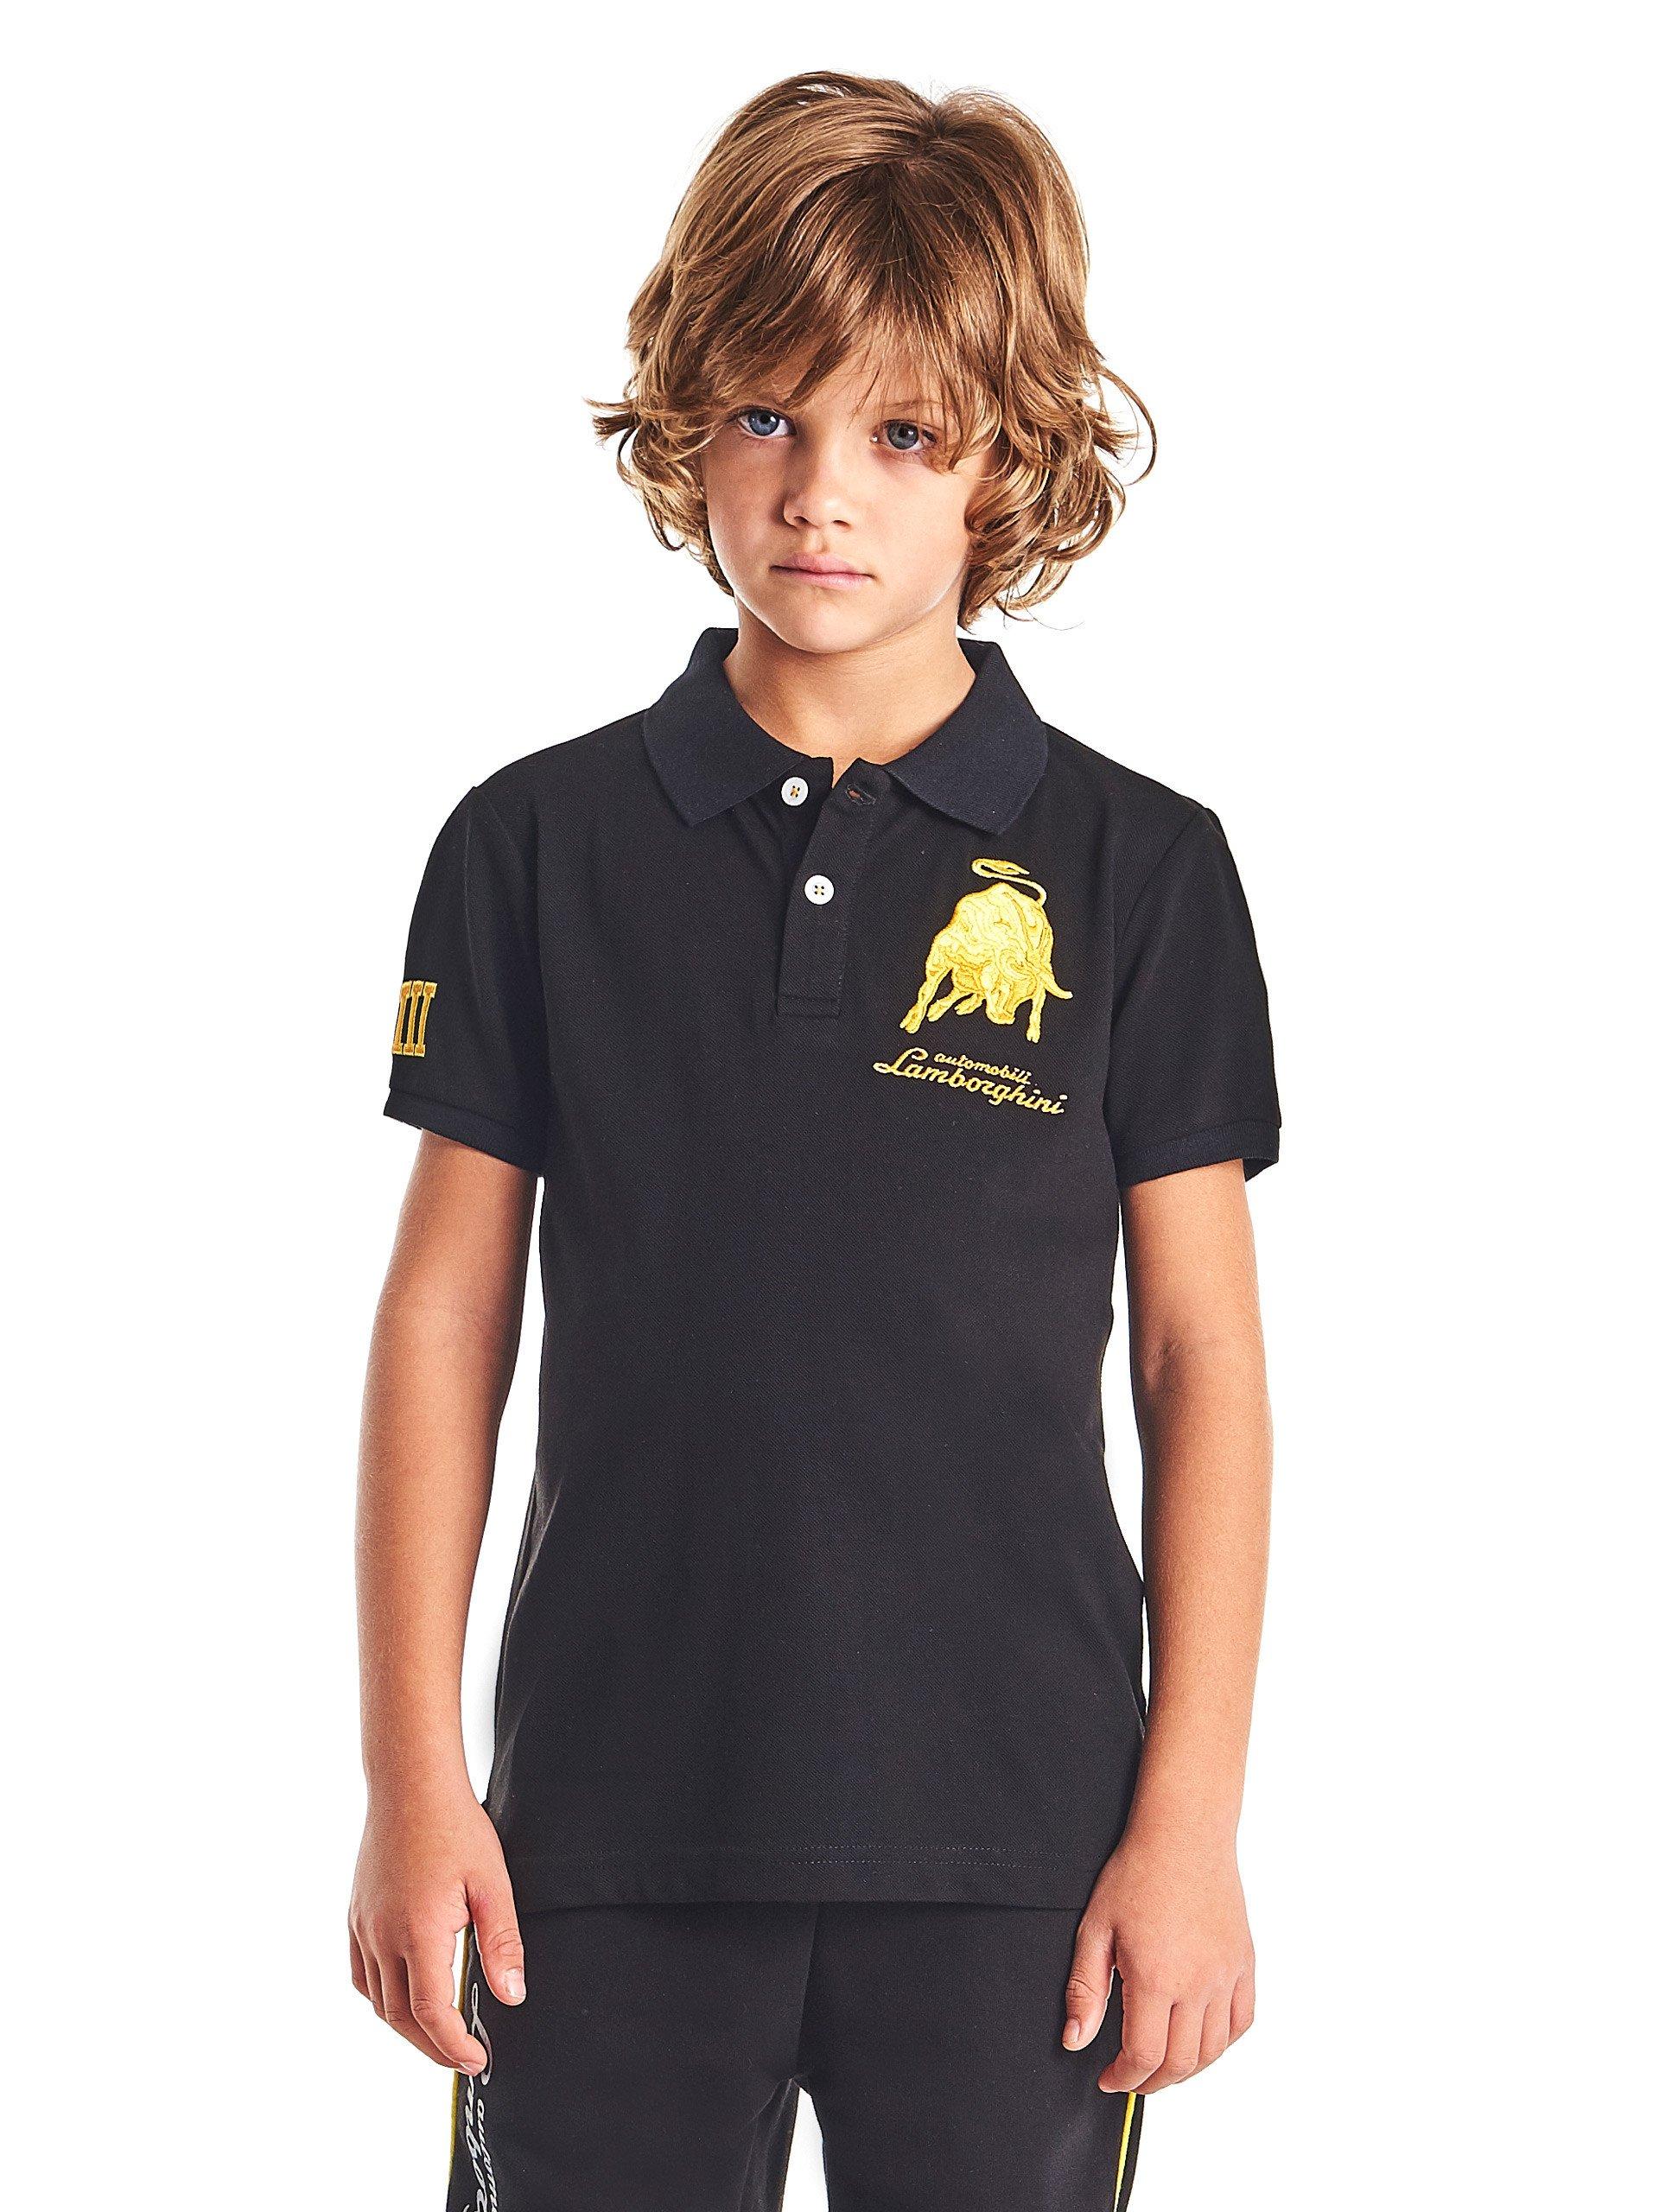 LAMBORGHINI Bull LXIII Kid's Polo Shirt, Black (6 Years)